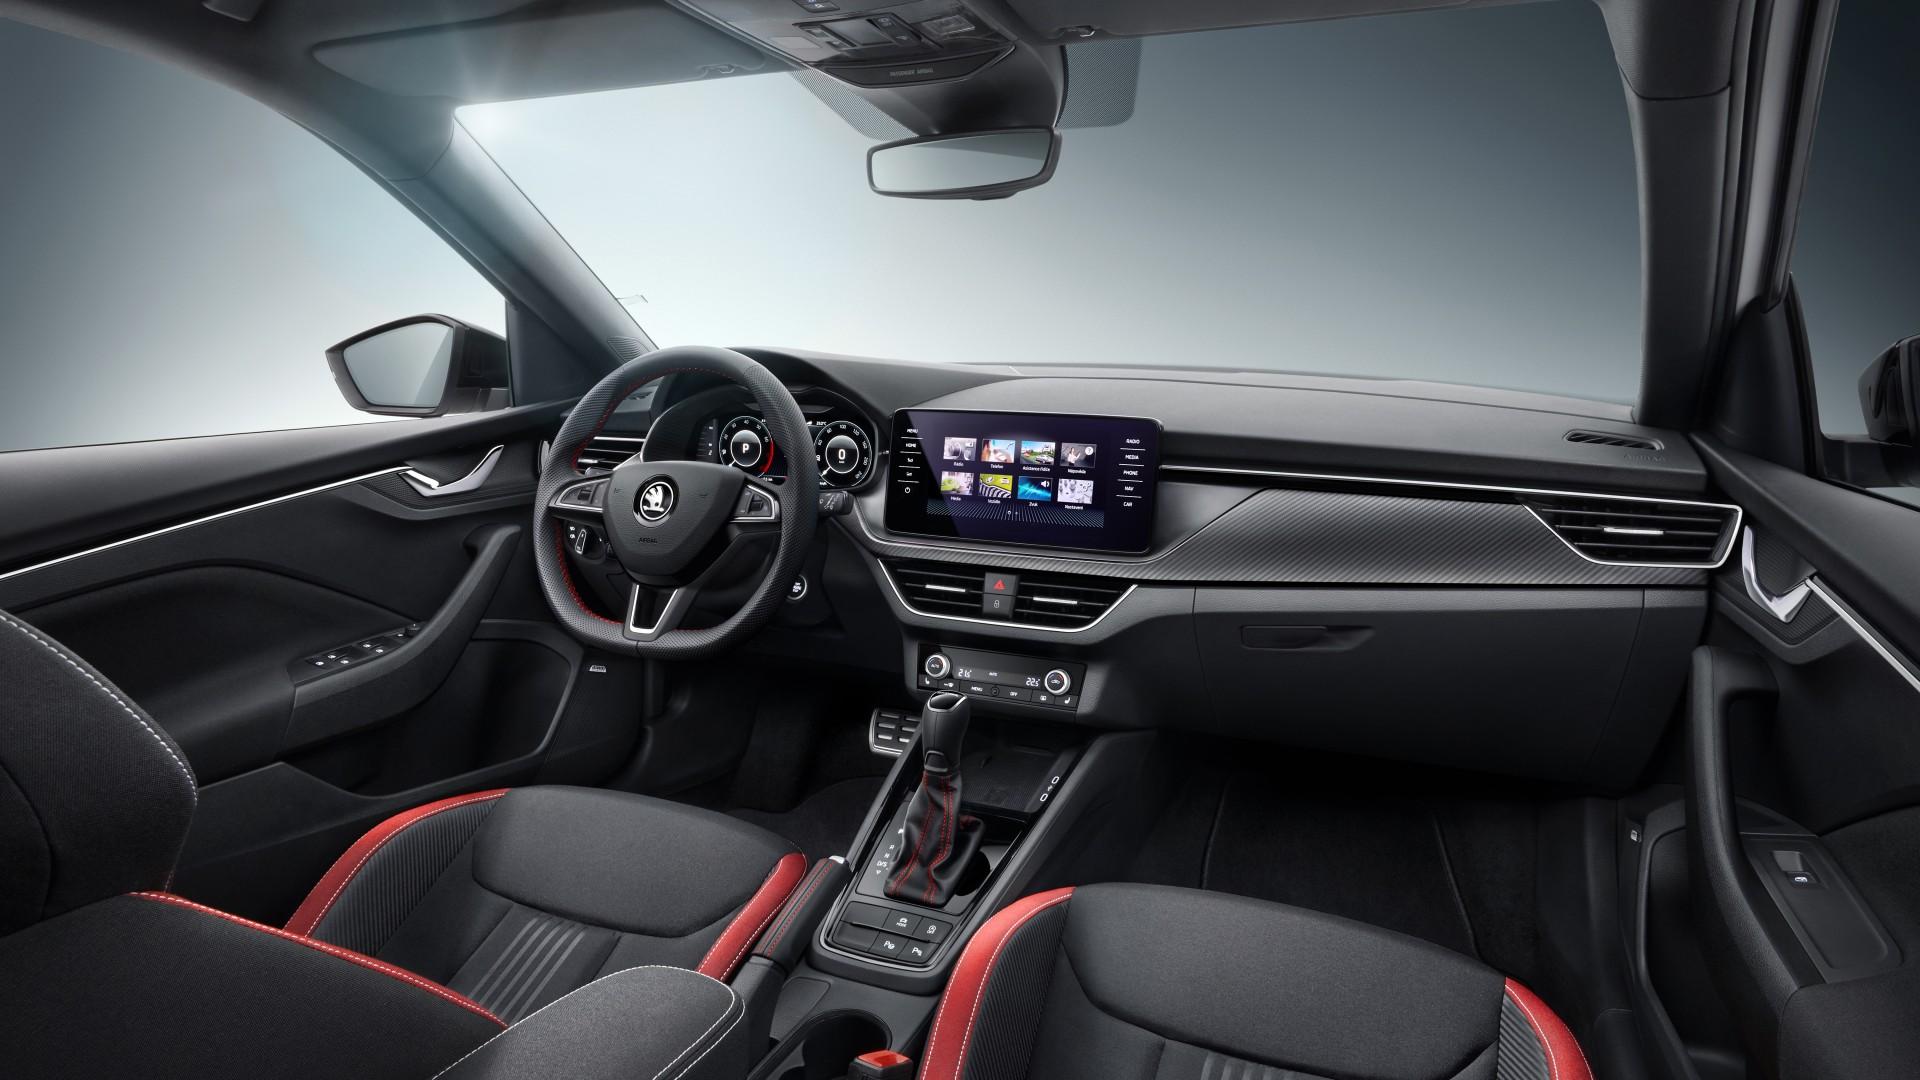 skoda kamiq monte carlo 2019 interior 4k wallpaper hd car wallpapers id 13284